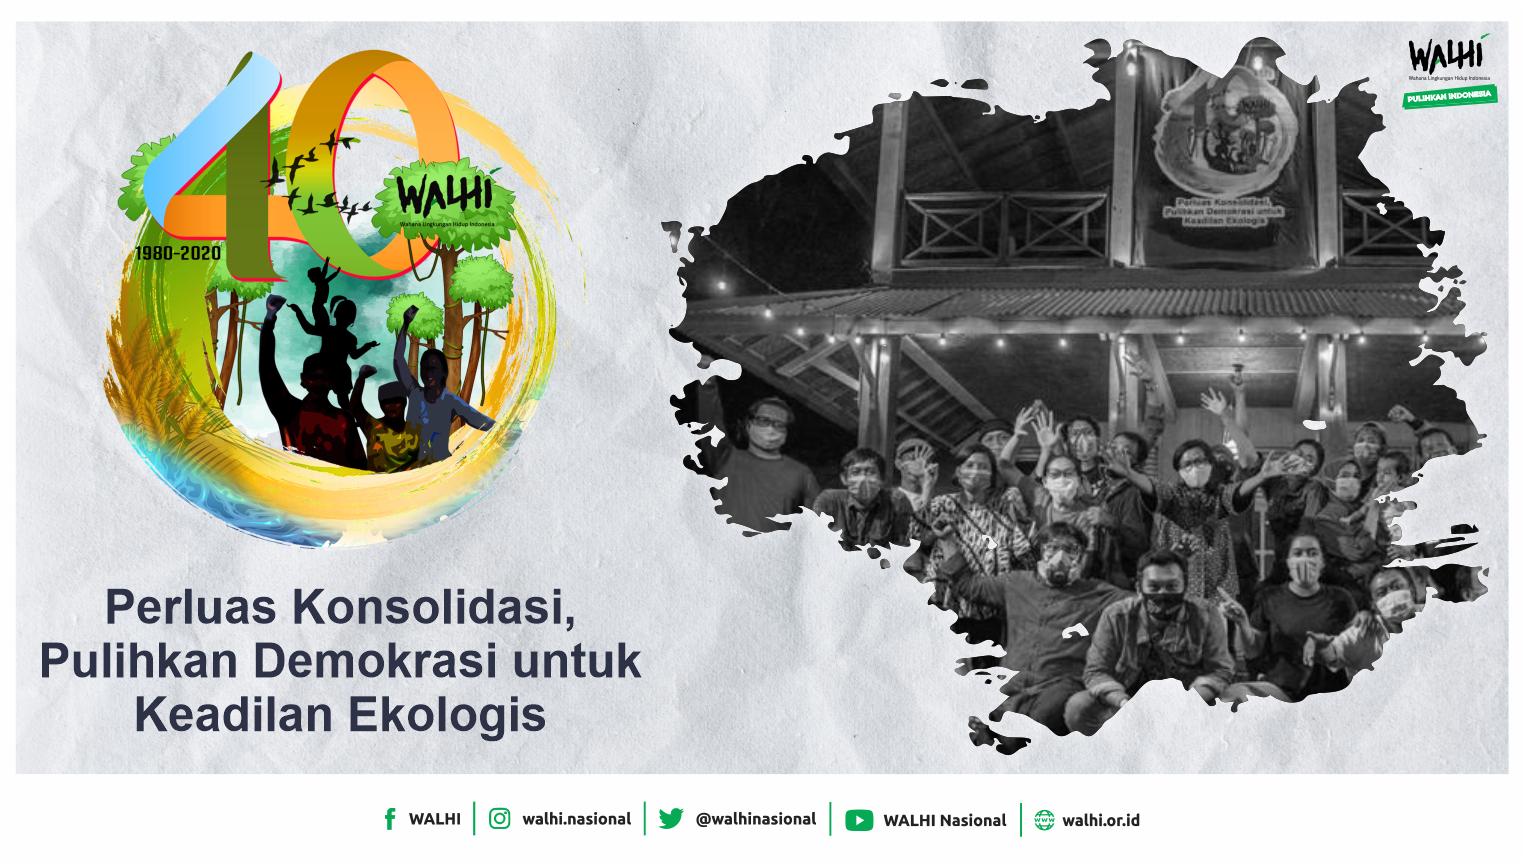 40 Tahun WALHI (1980-2020)